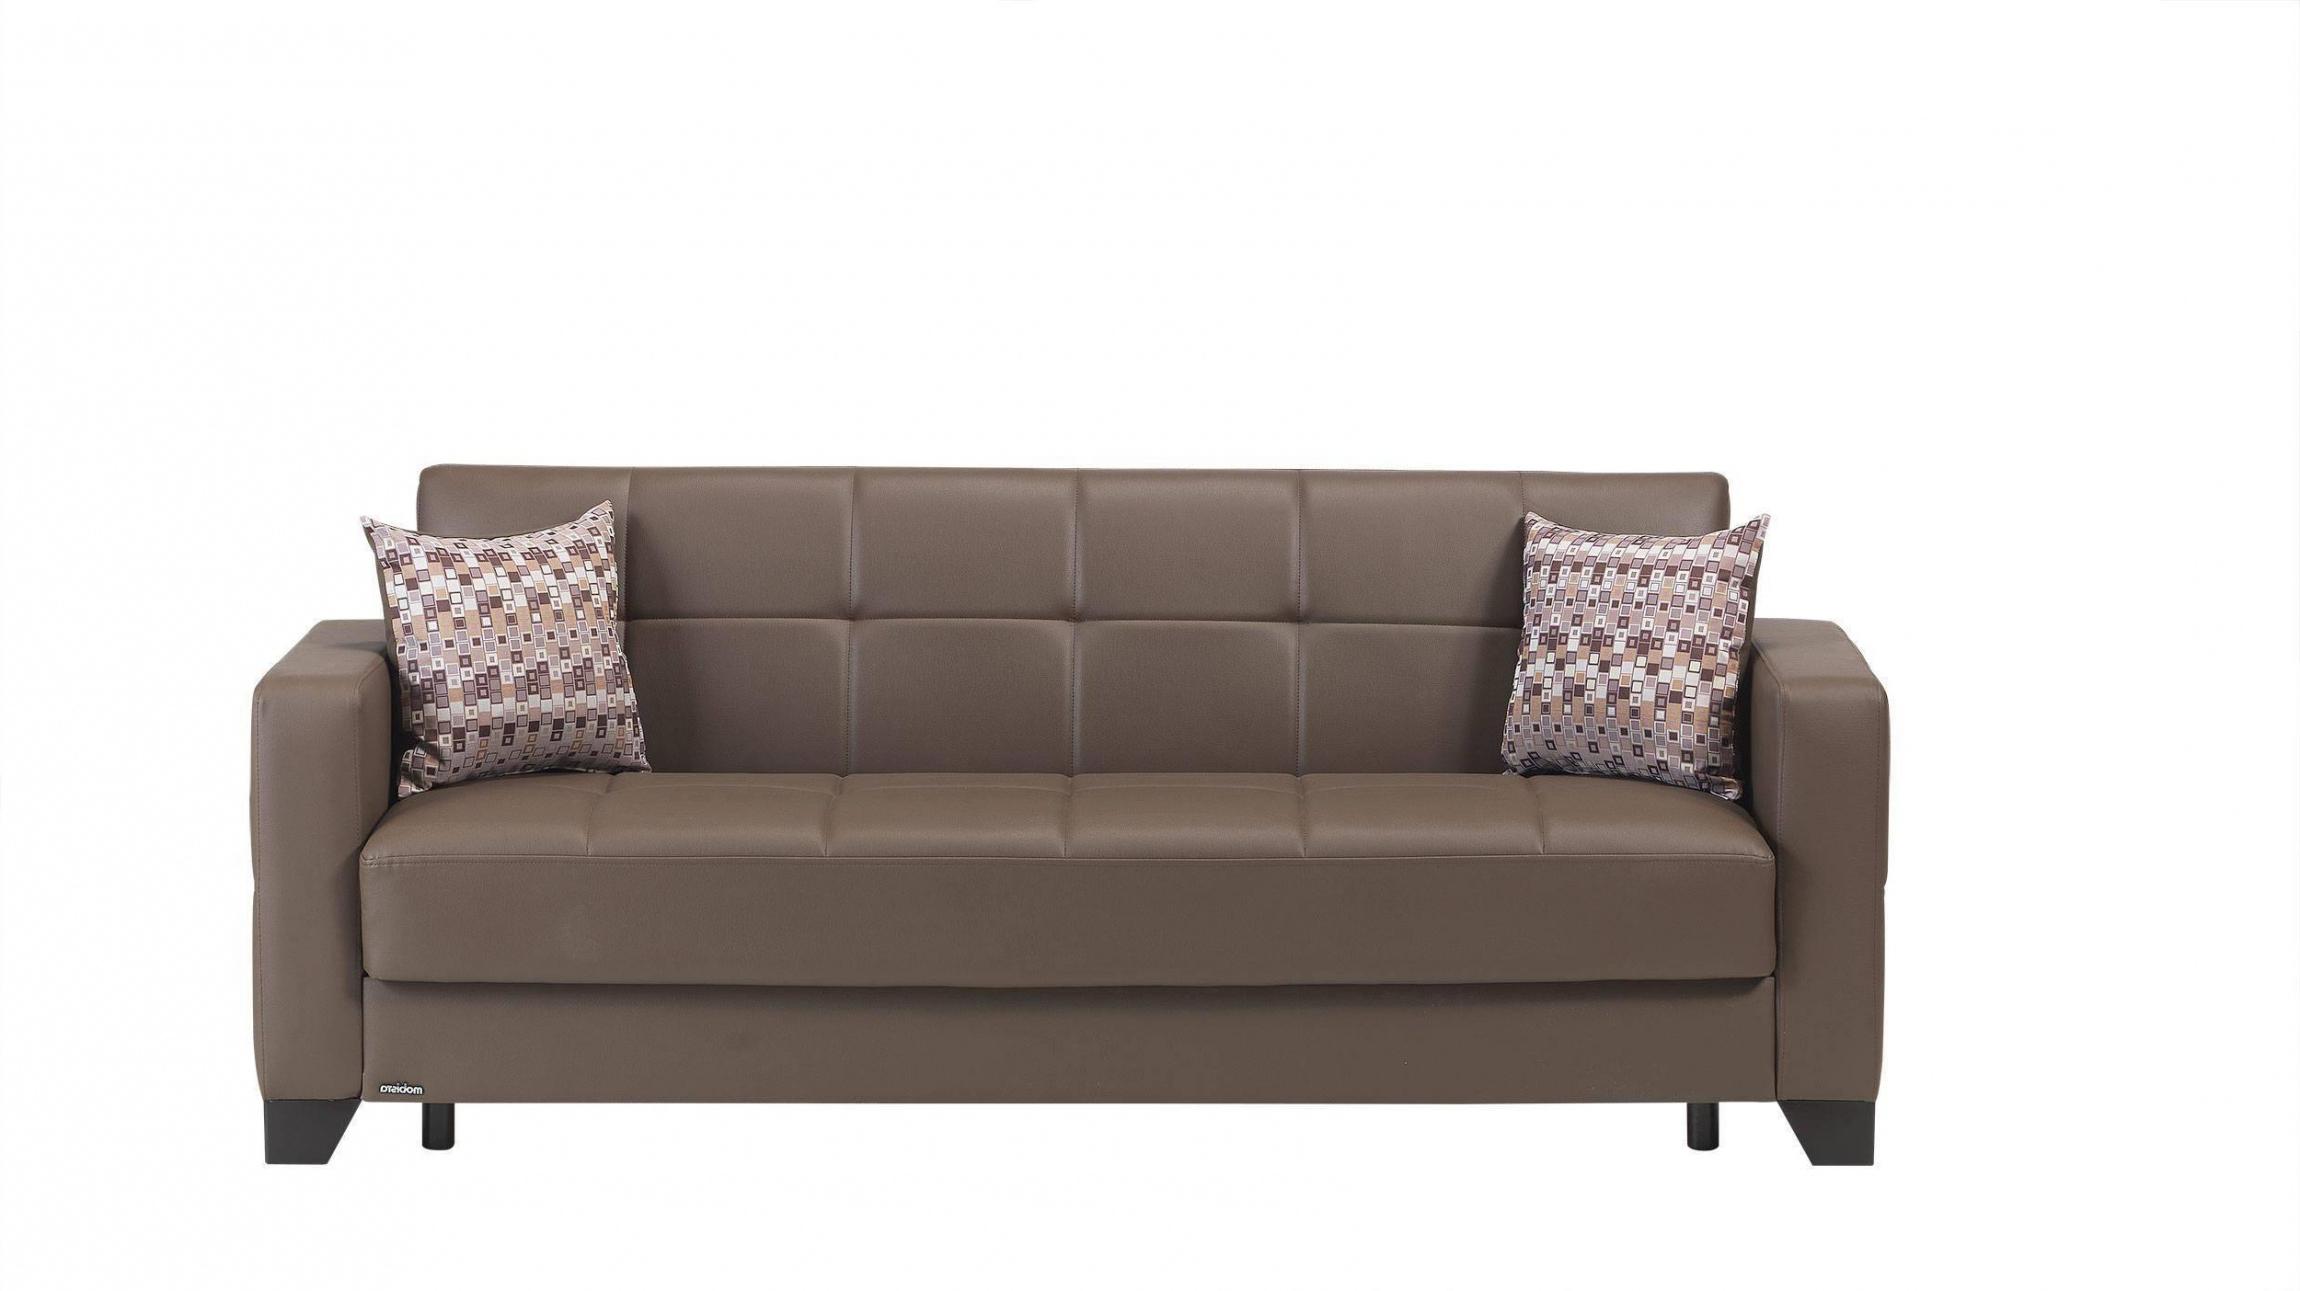 Sofa Cama Italiano Ikea Q0d4 sofa Cama Italiano Ikea Stunning Enchanting sofa Cama Cargando